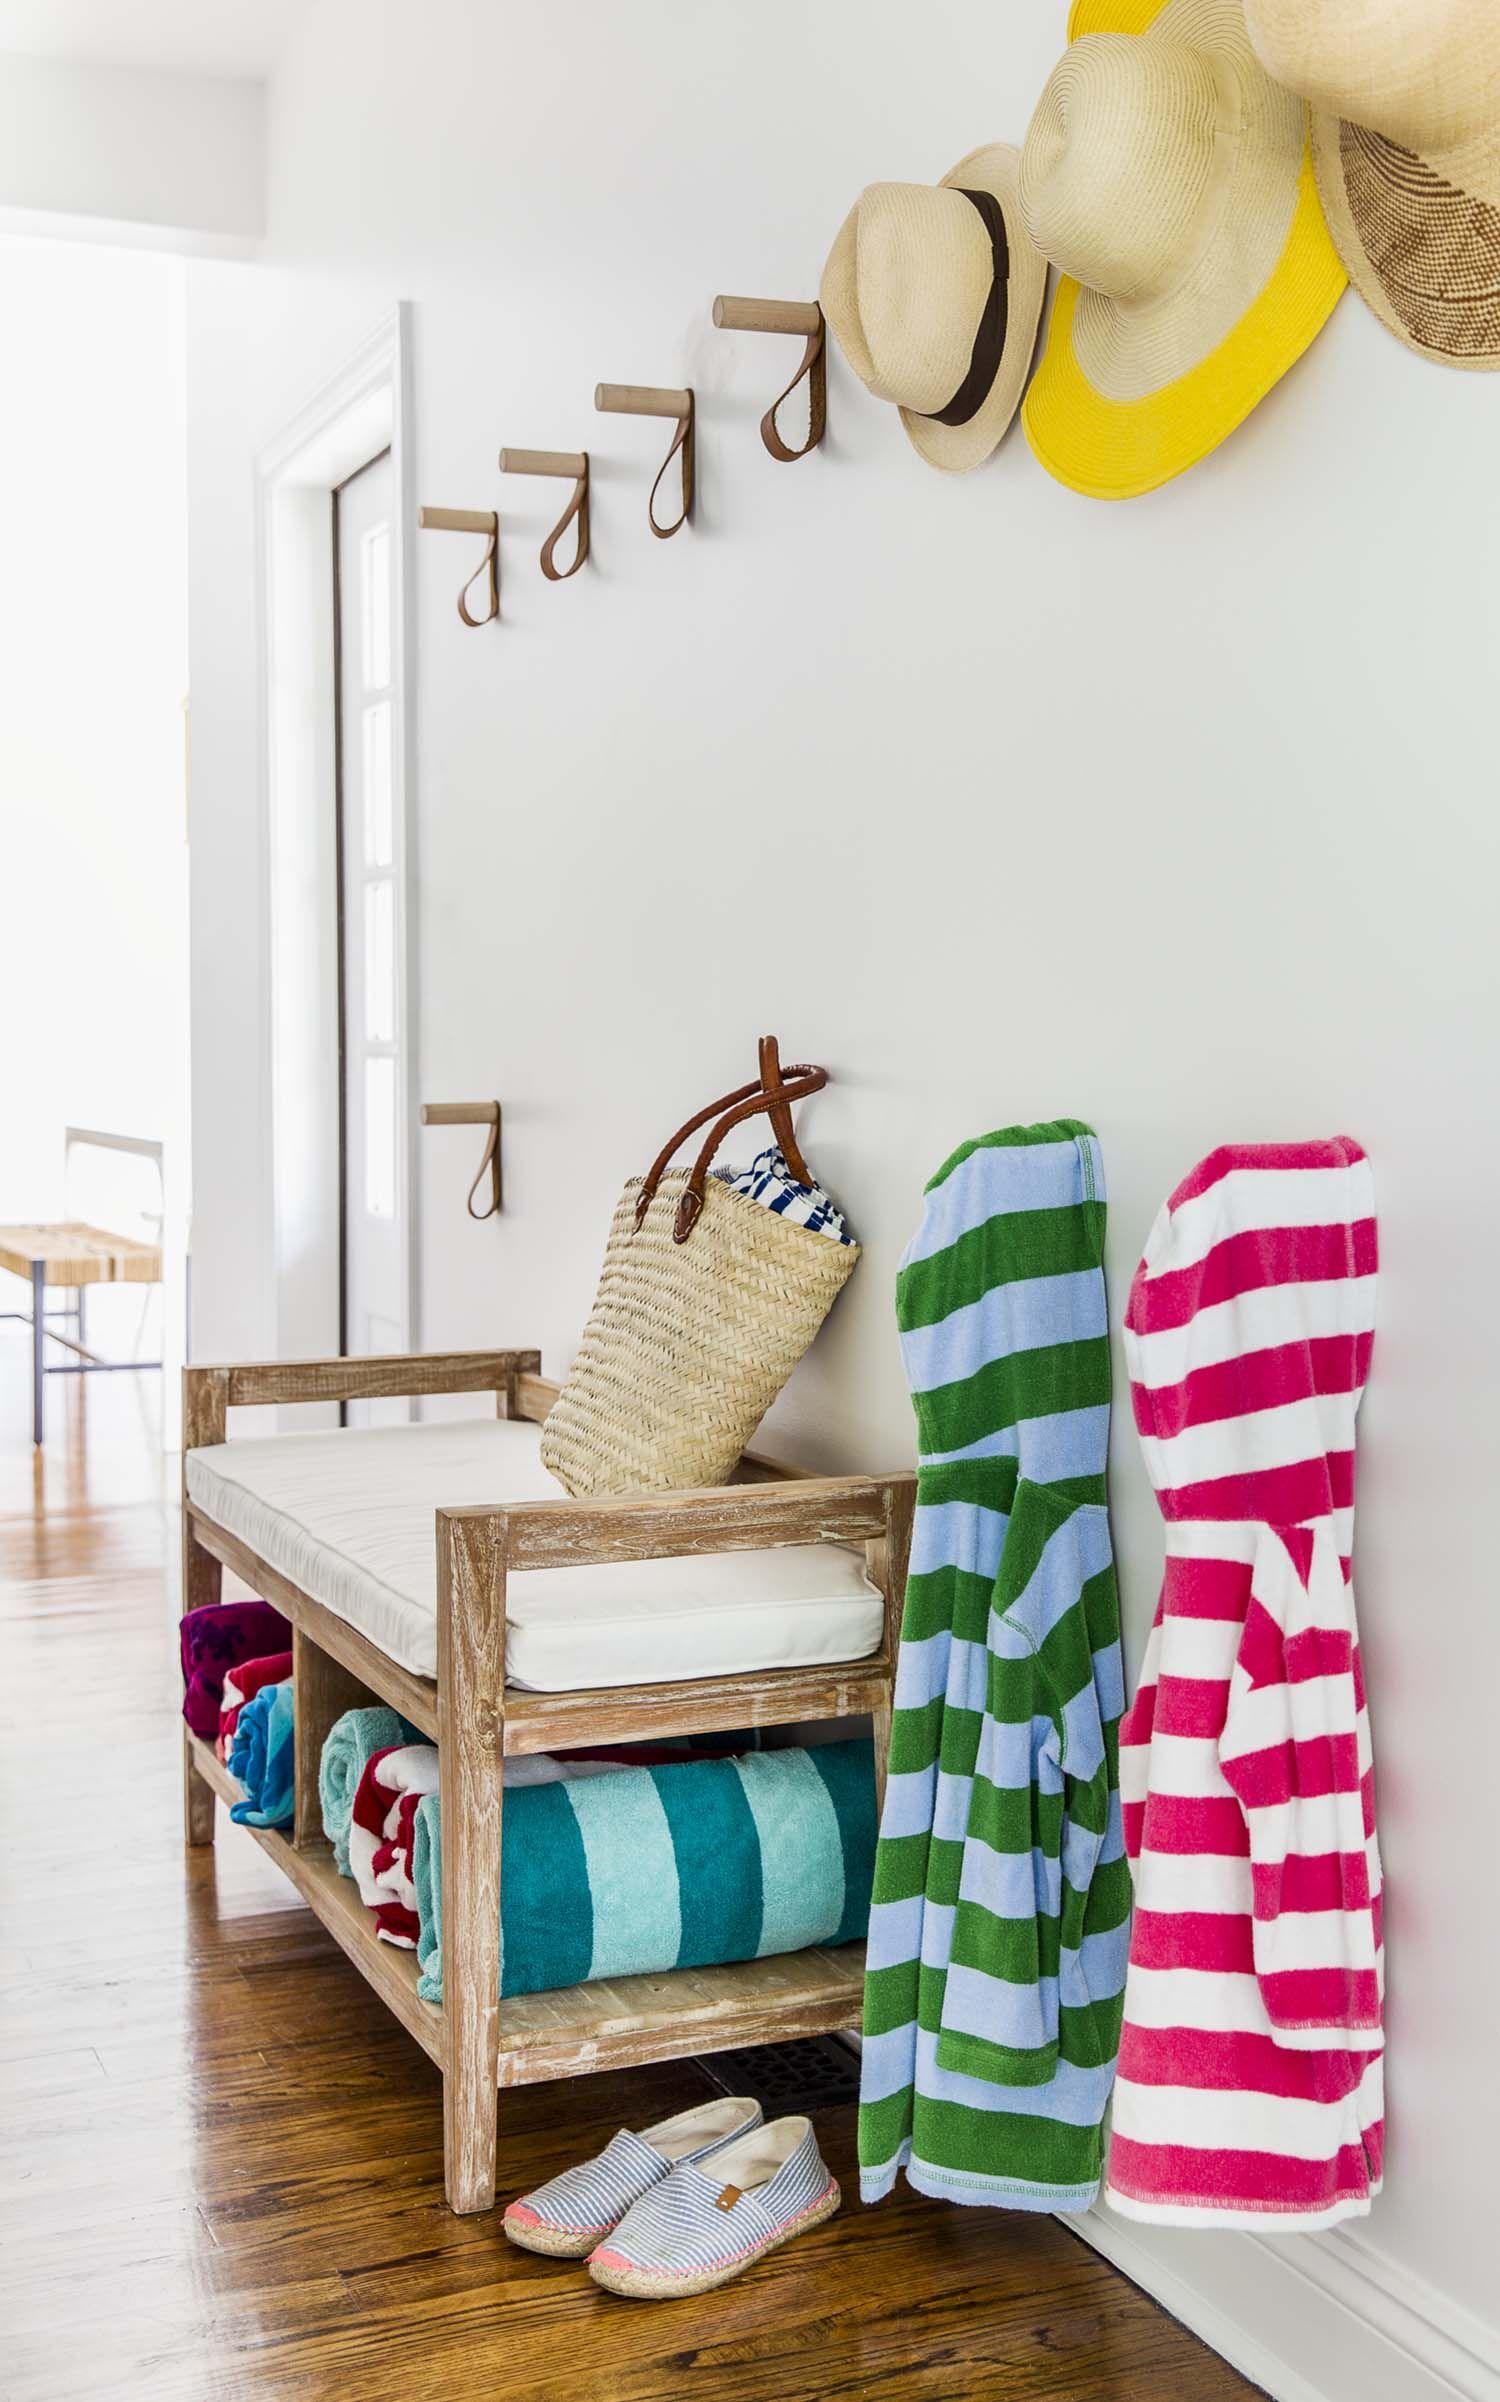 and playful interiors characterizes this westhampton beach house - Ideen Fur Regenschirmstander Innendesign Bestimmt Auswahl